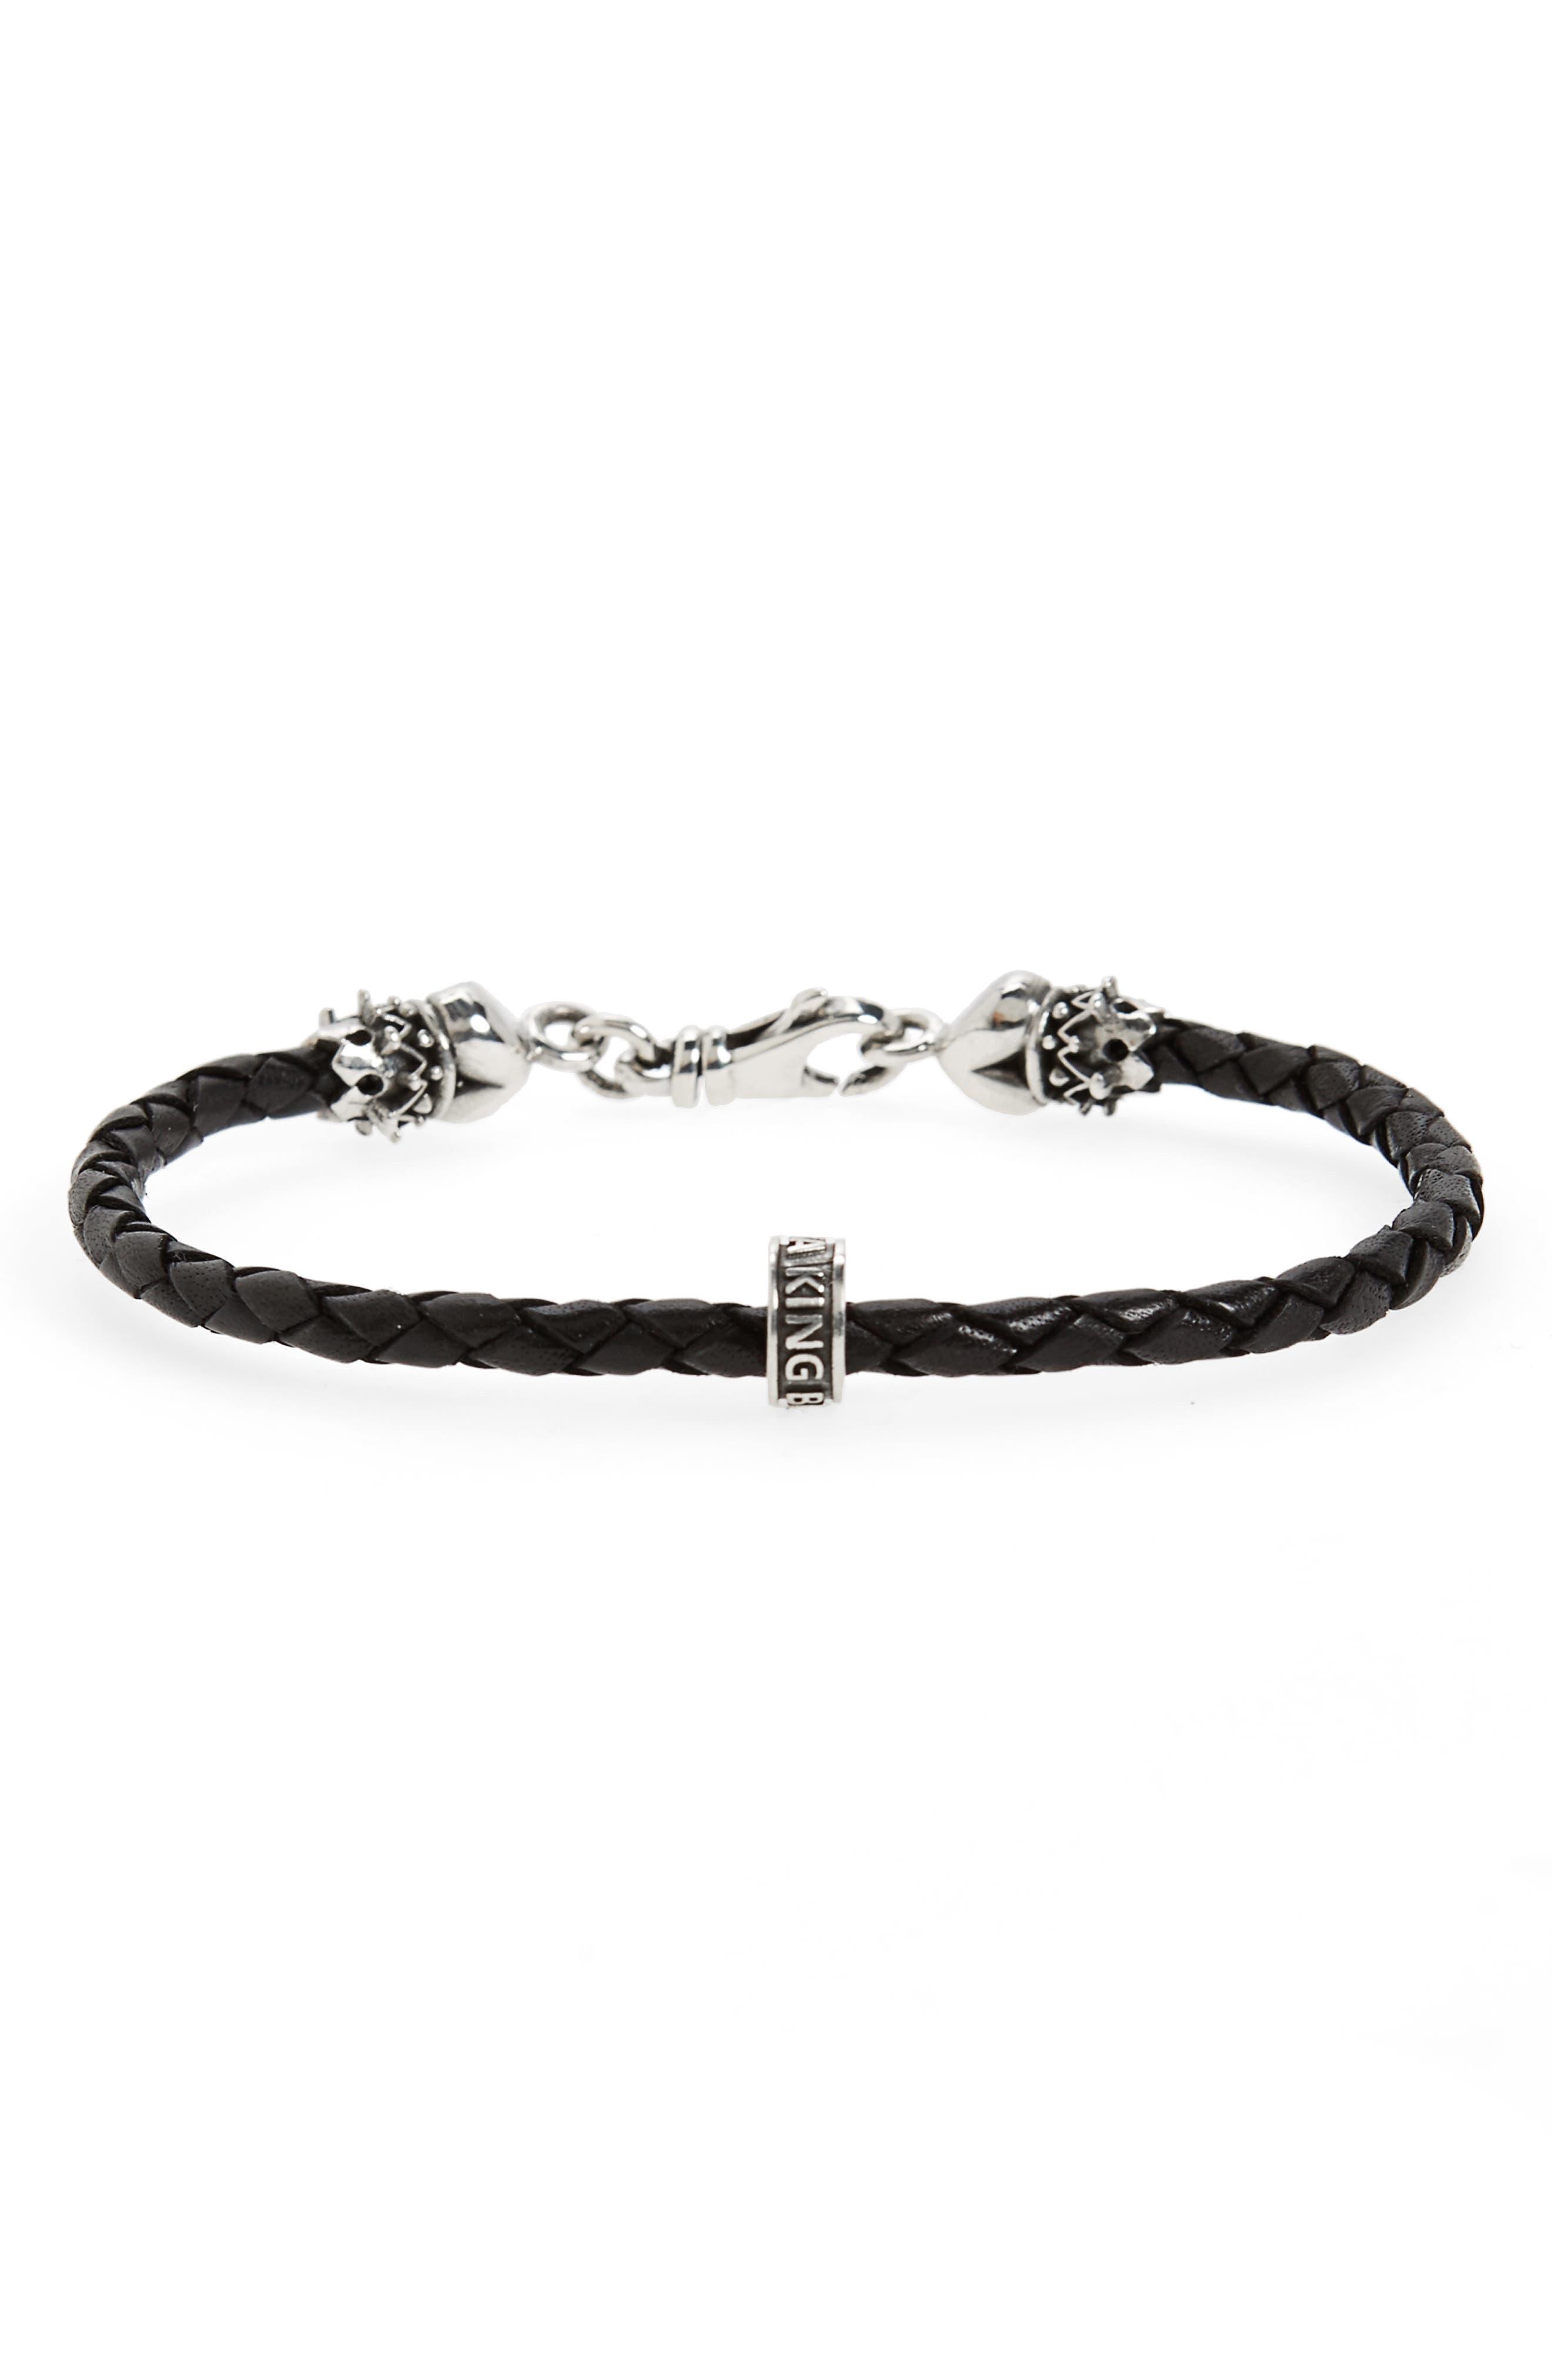 Braided Leather Bracelet,                         Main,                         color, 041